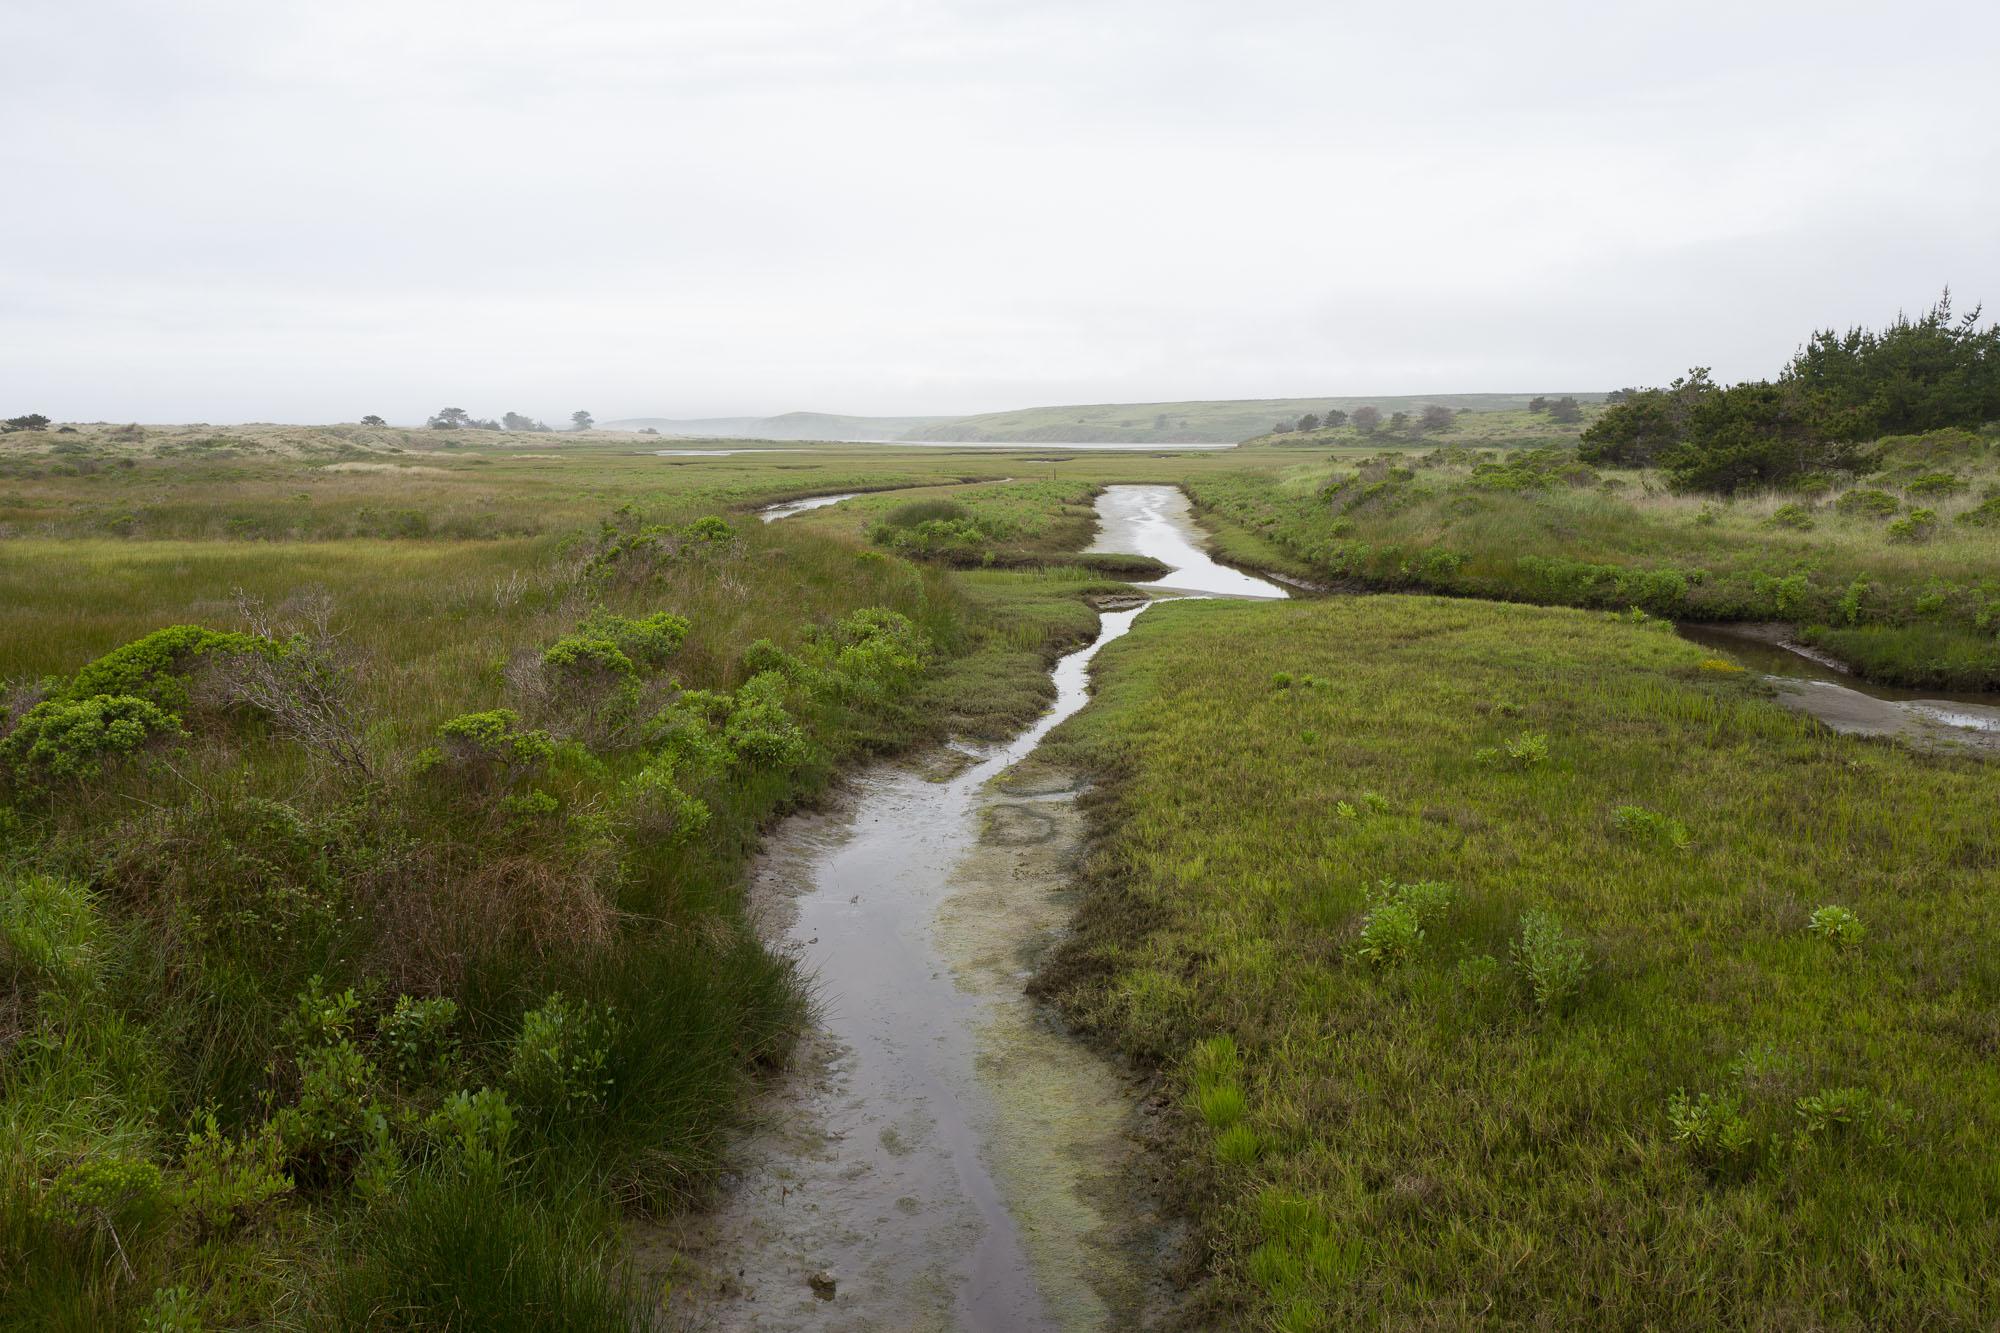 Estero de Limantour